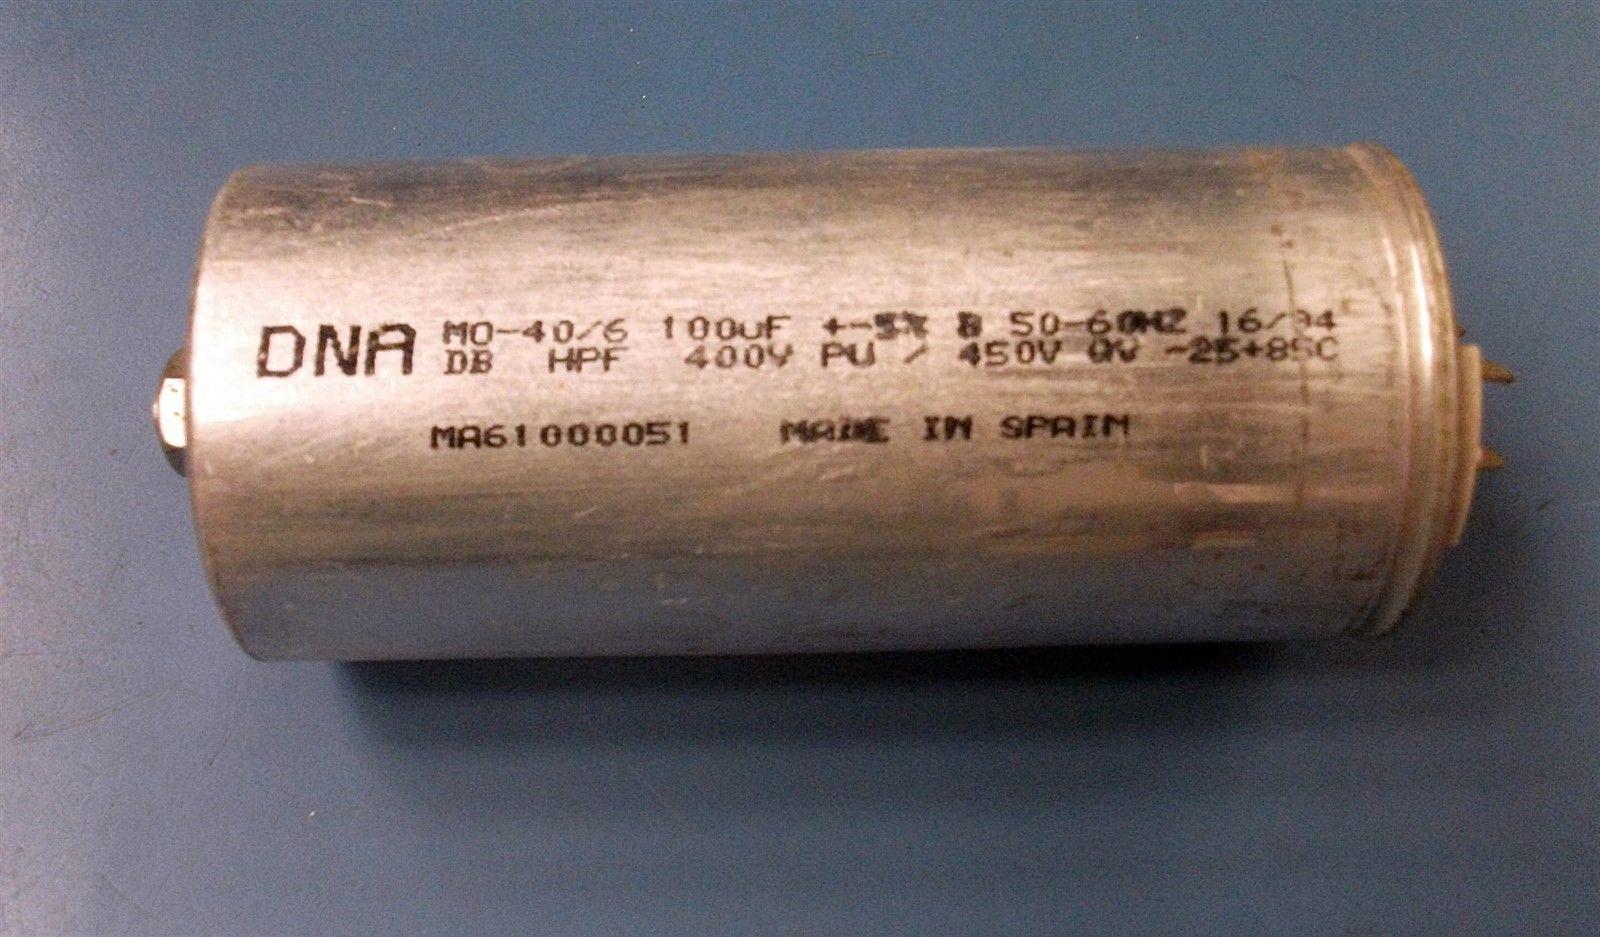 DNA Capacitor Start/Run 100 mf 400/450 V 50/60Hz USED